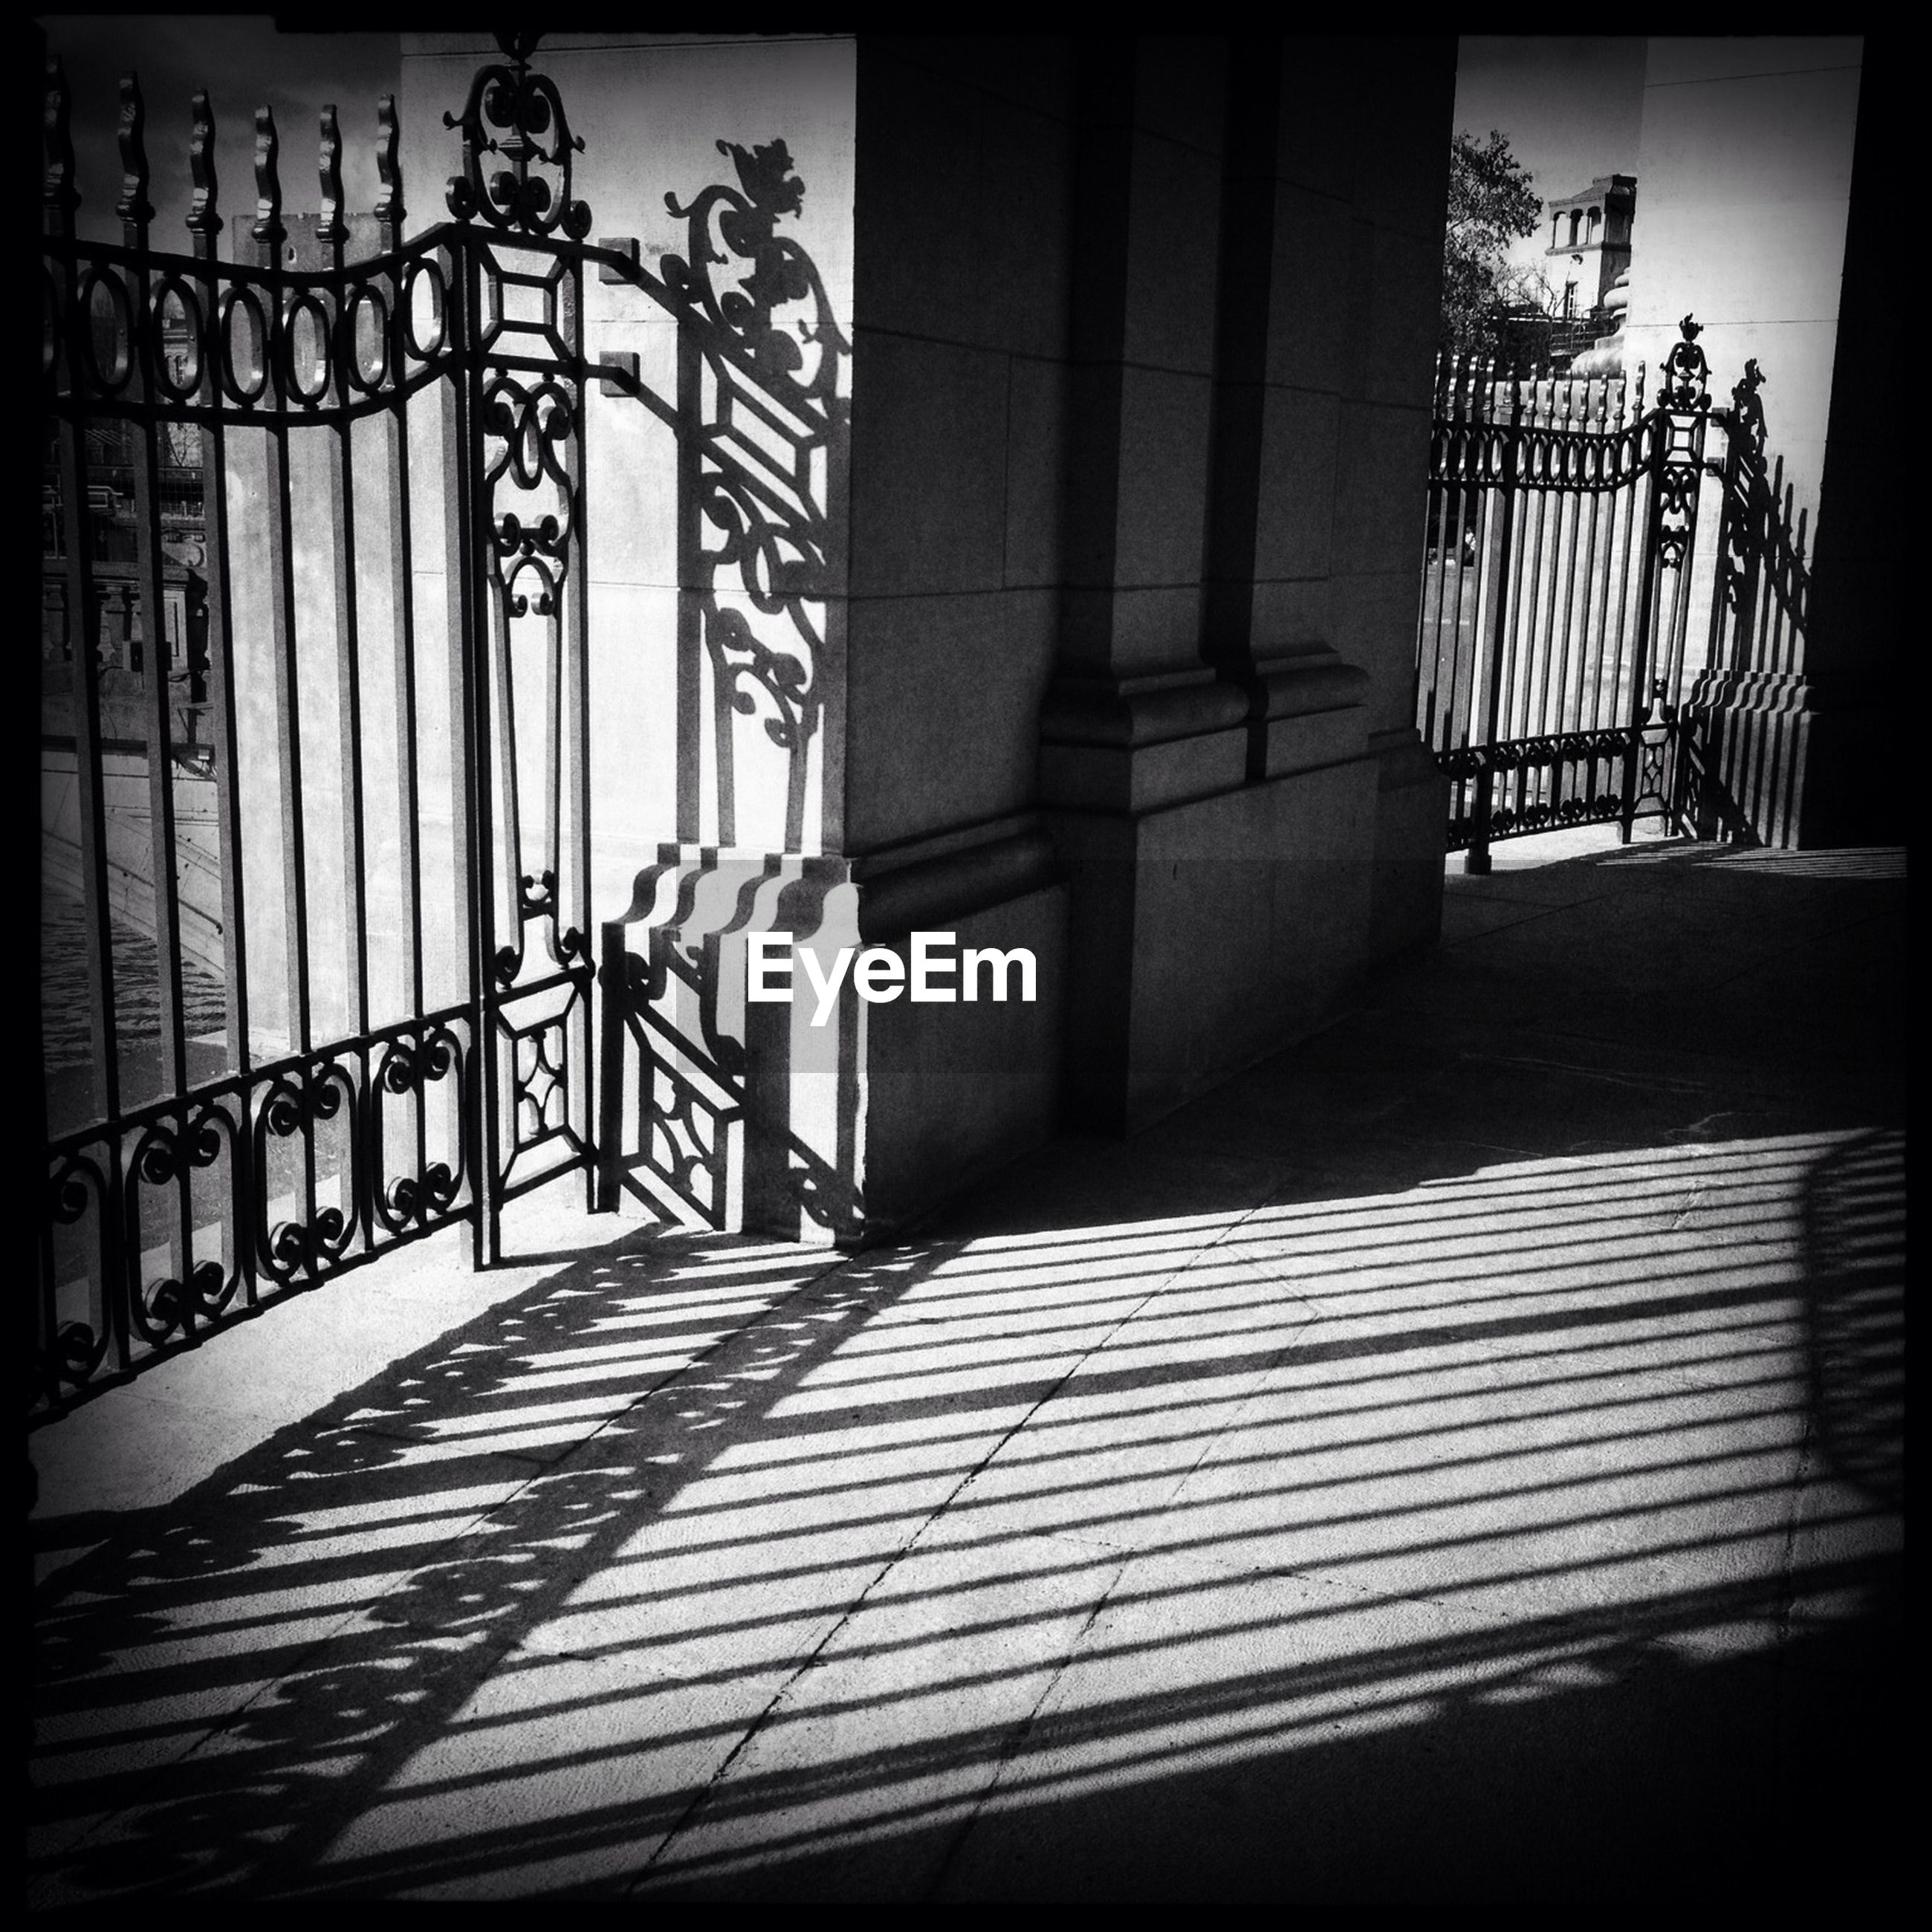 Shadow of gate falling on courtyard